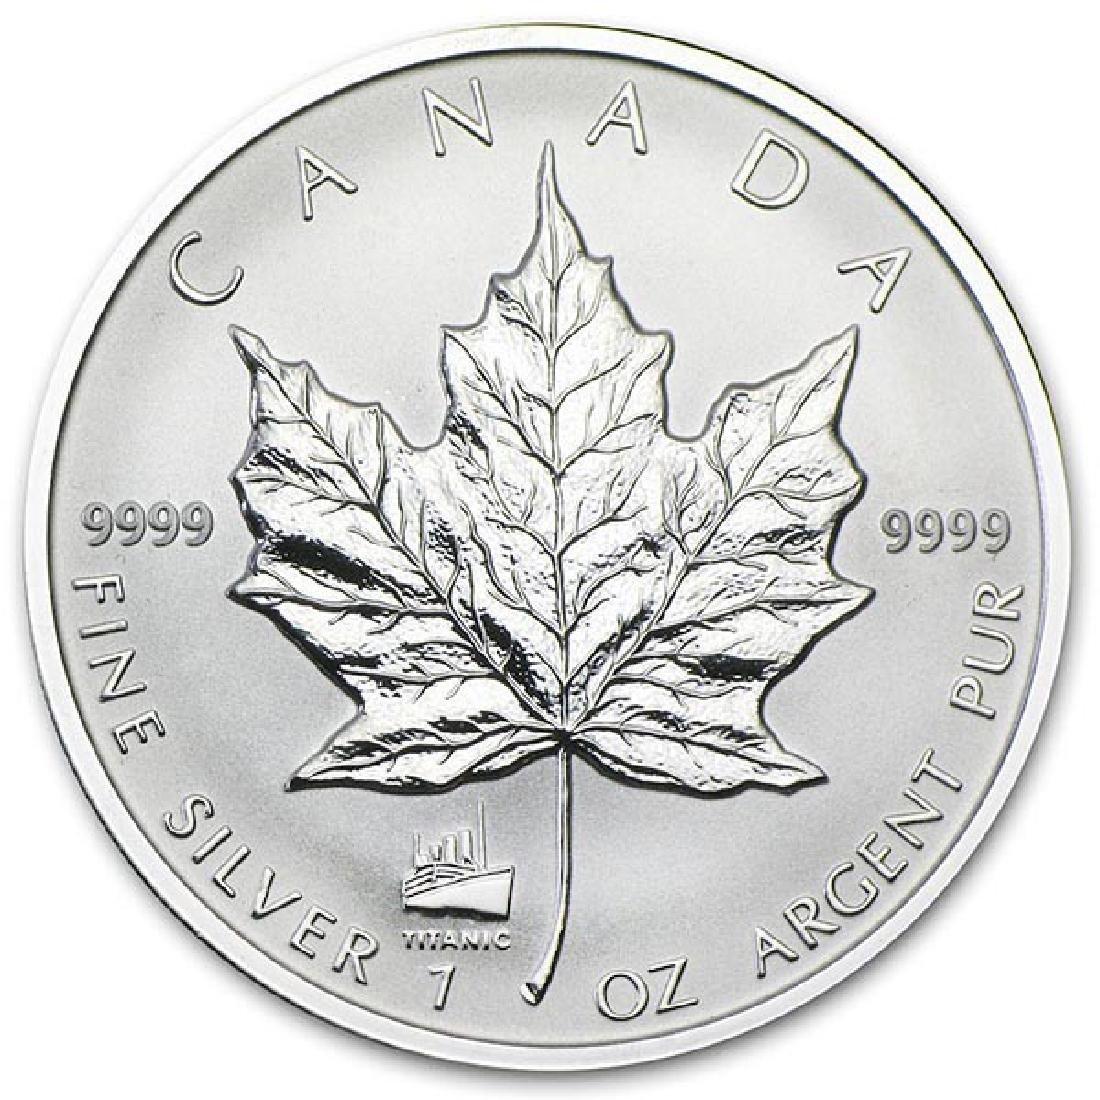 2012 Canada 1 oz. Silver Maple Leaf Reverse Proof Titan